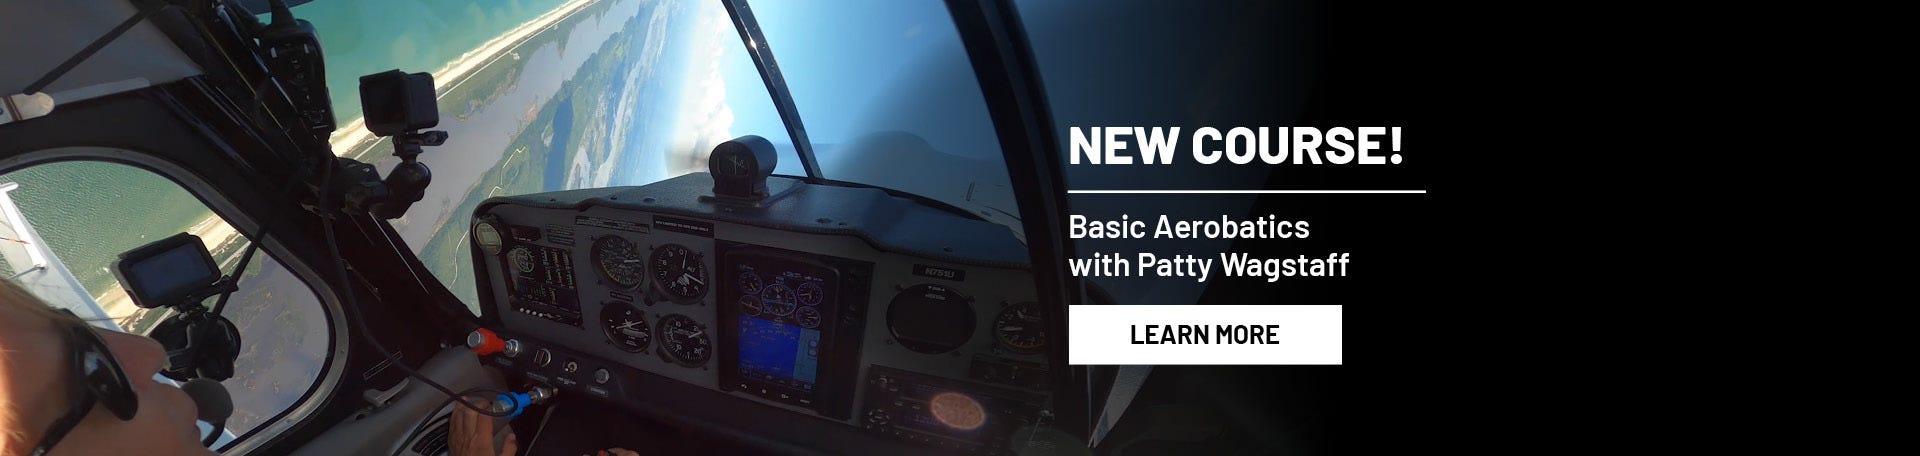 Aerobatics Course